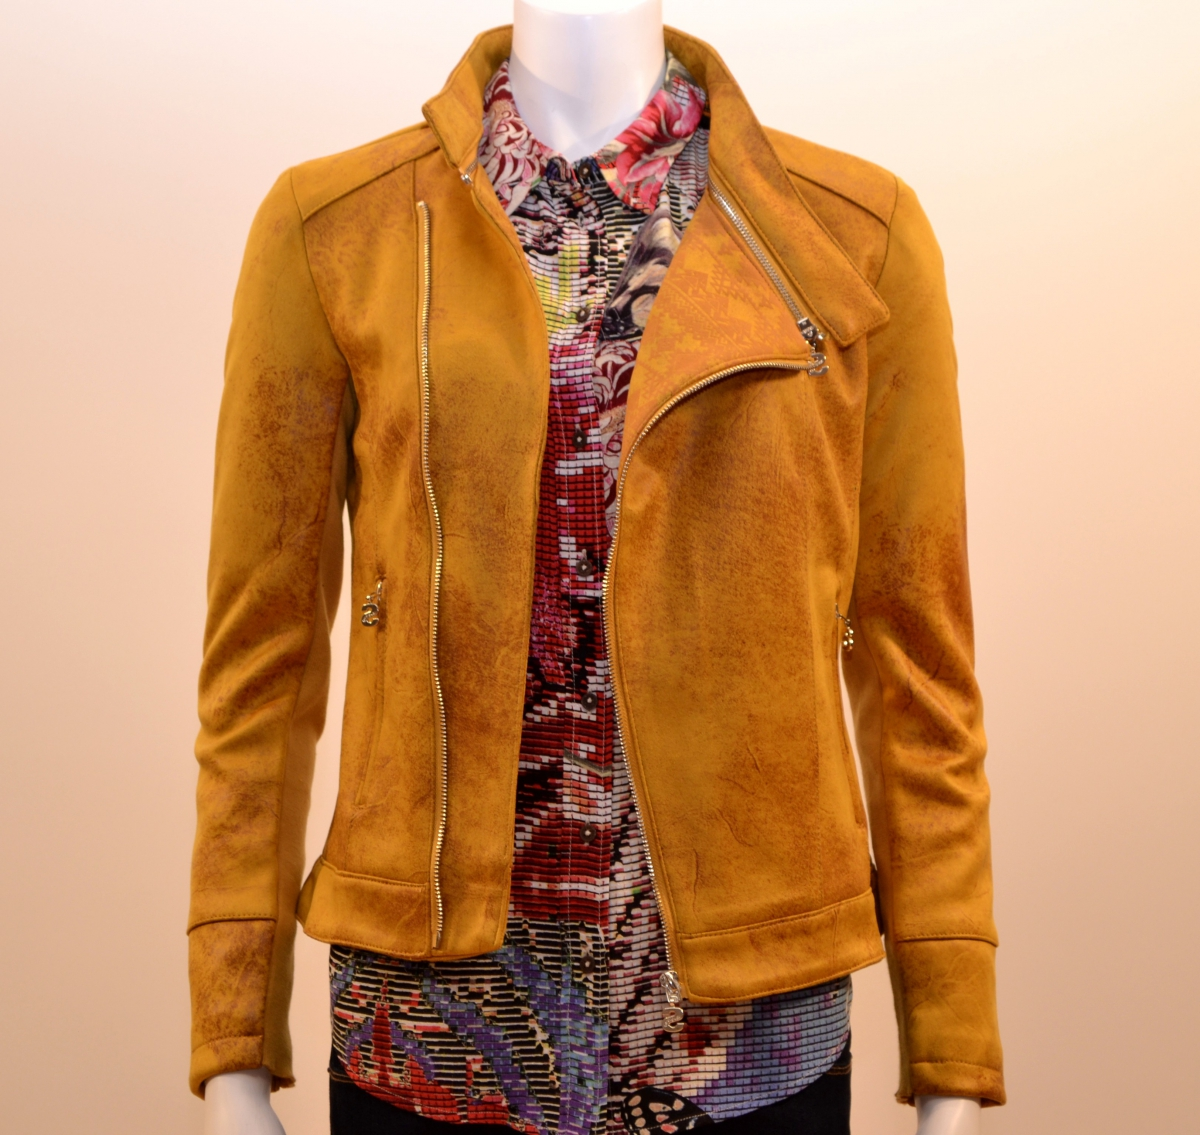 eba607d63c06f Blouson DESIGUAL MERLIN 18WWEWBT Zarlos DESIGUAL - Vêtements de ...